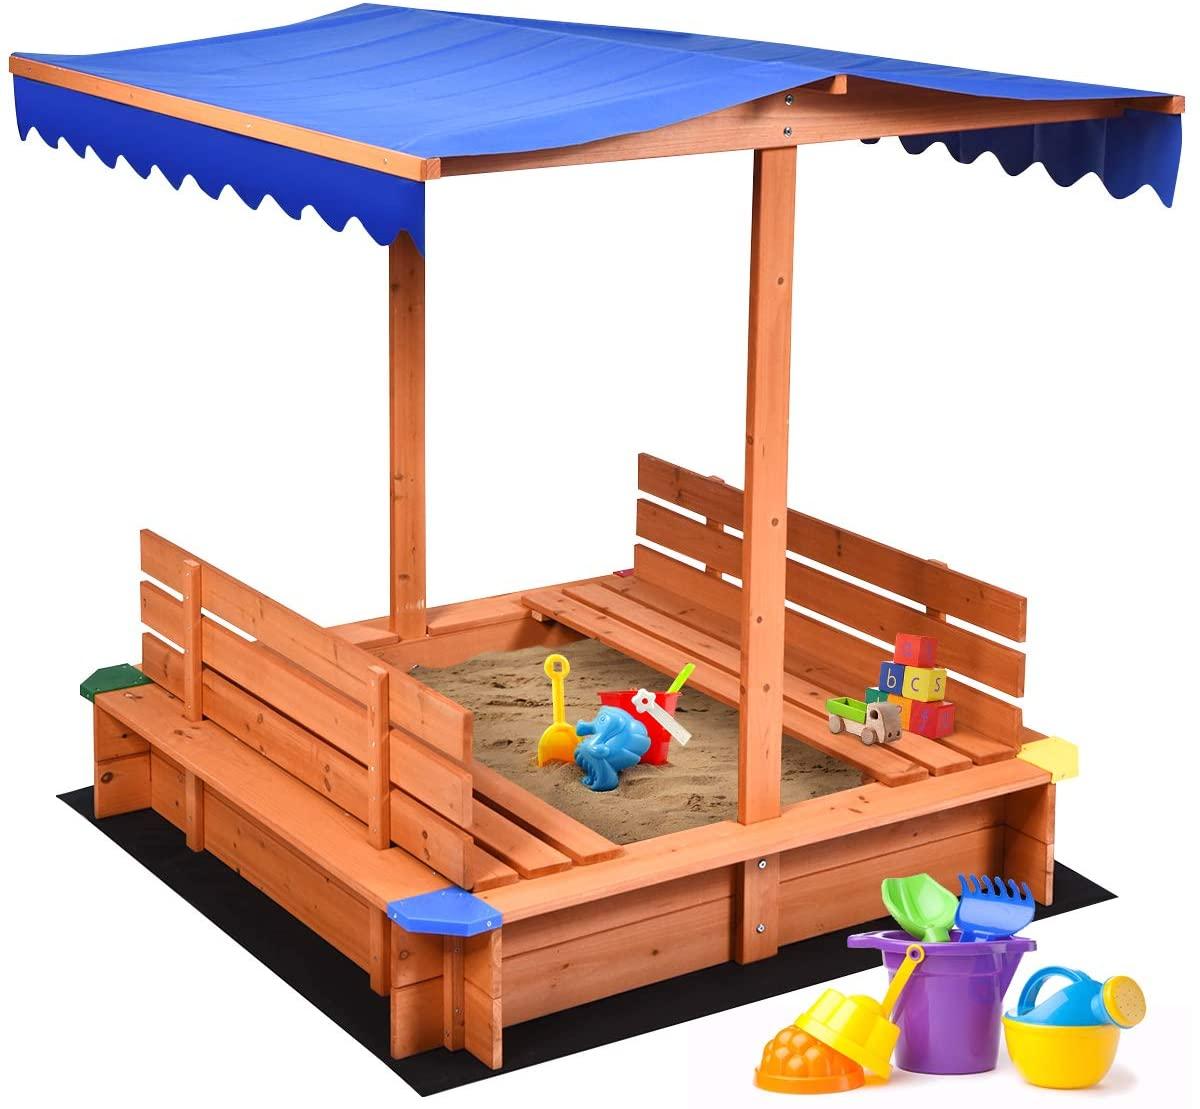 Costzon Kids Wooden Sandbox with Canopy, Cedar Square Cabana Sandbox with 2 Bench Seats, Non-Woven Fabric Cloth, Children Outdoor Playset for Backyard, Home, Lawn, Garden, Beach